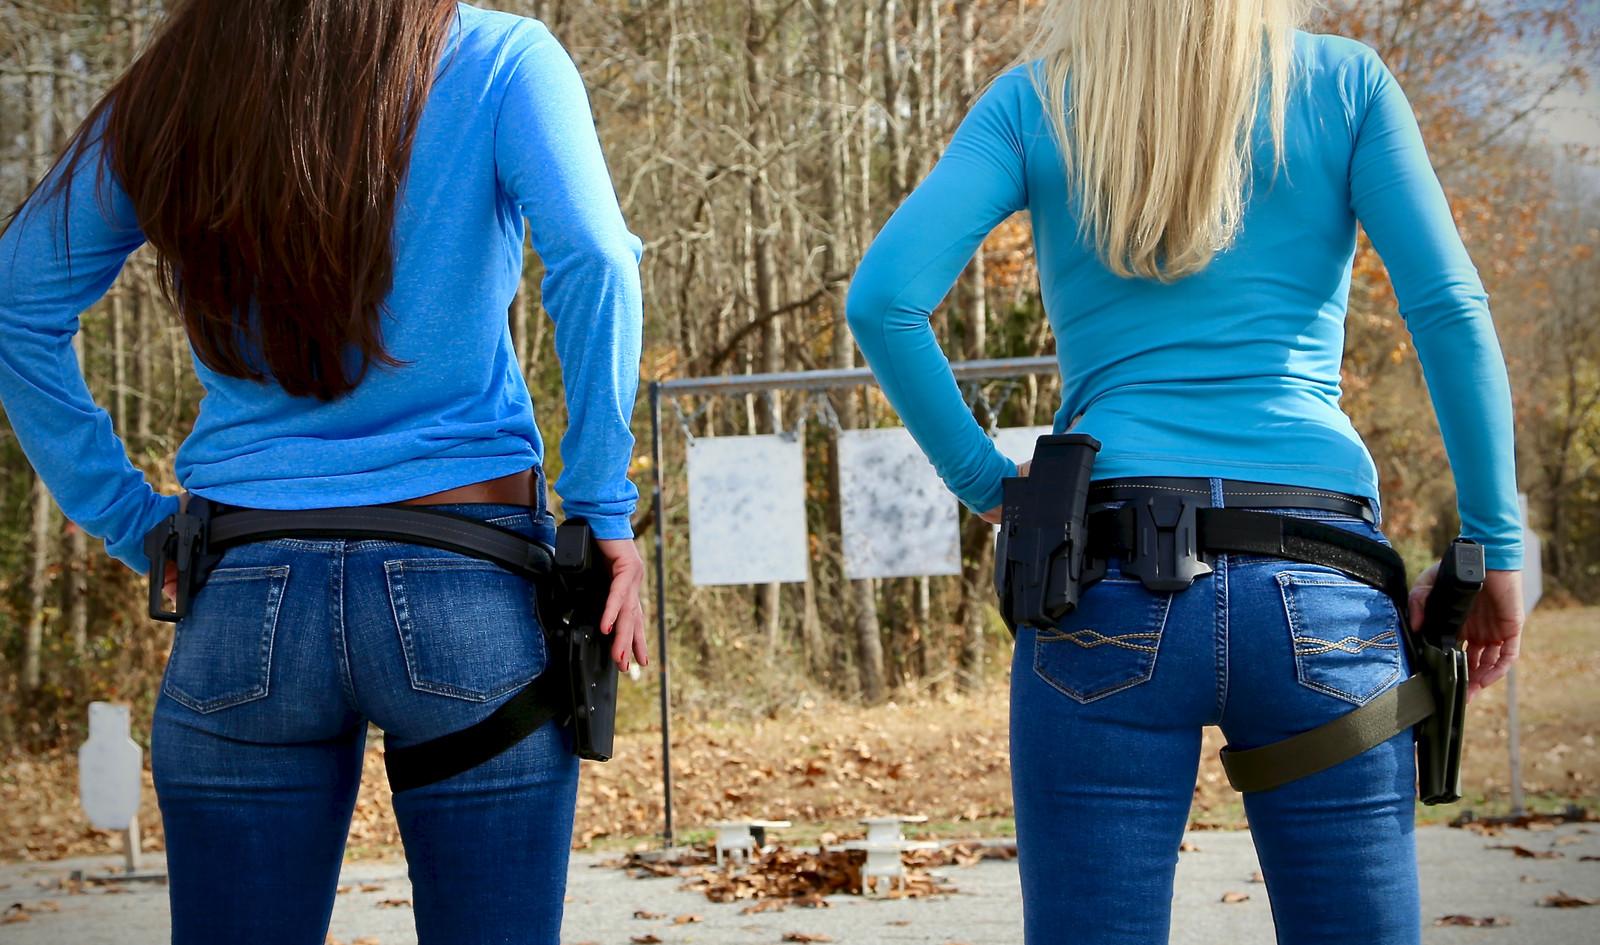 S And W >> Girl Shooting on Range Virginia, Best Gun Shop Chesapeake ...